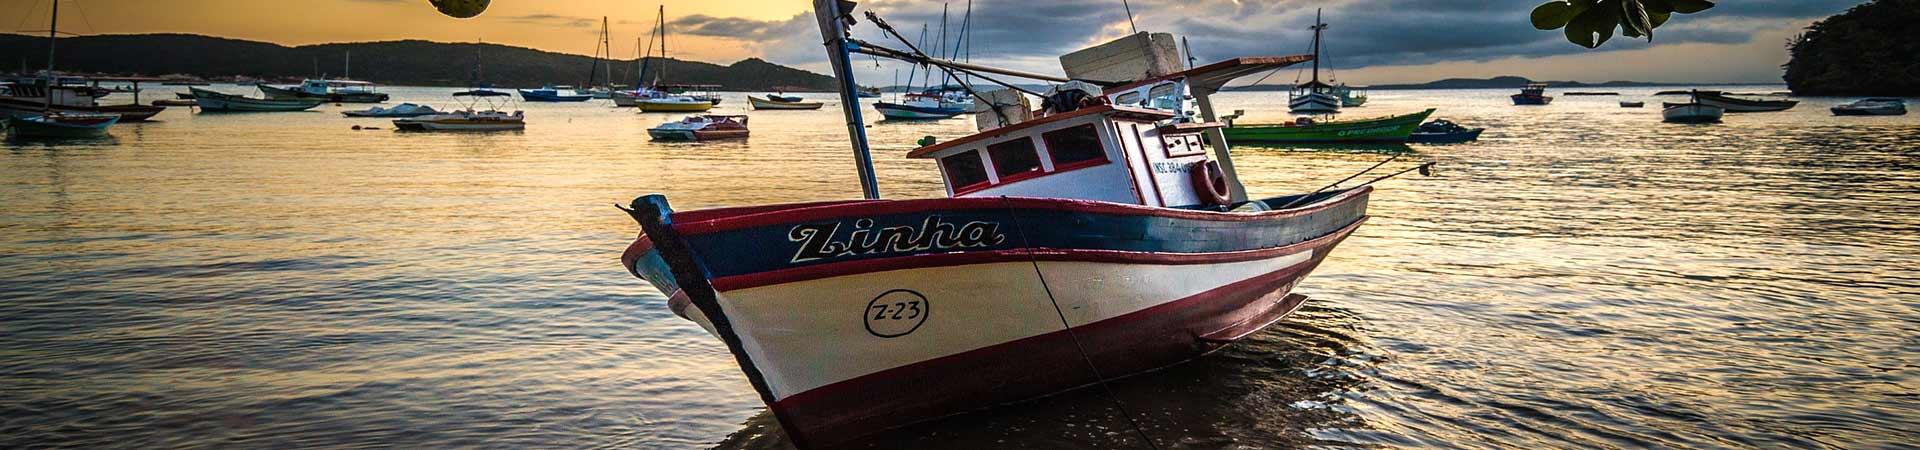 Boat on Beach in Brazil